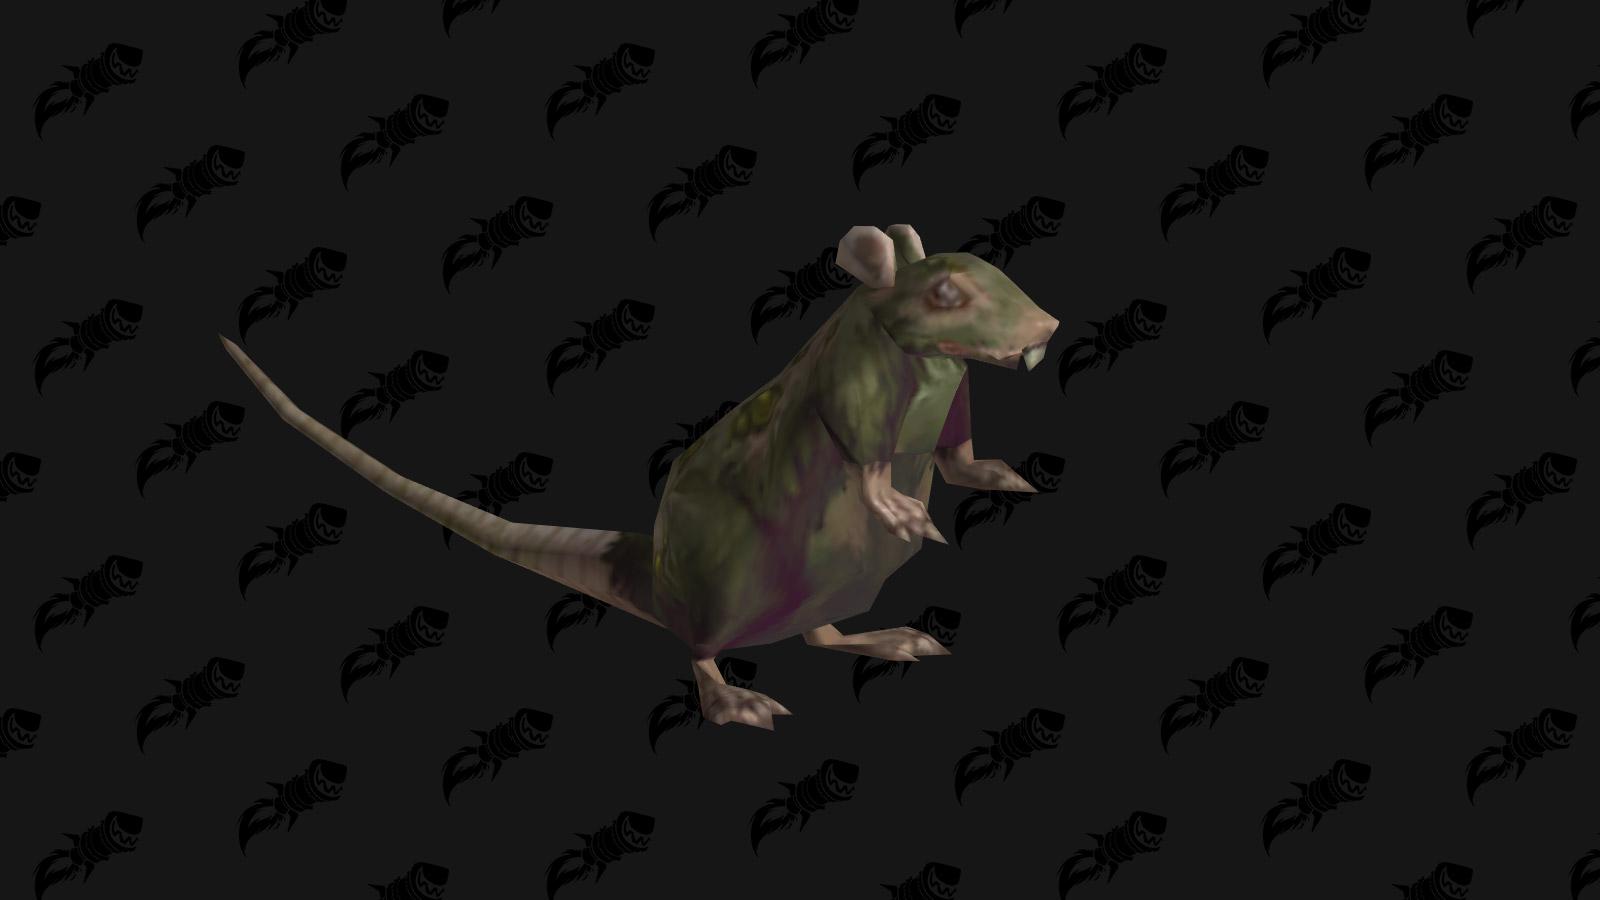 Rat lépreux : Défi de mascottes Gnomeregan